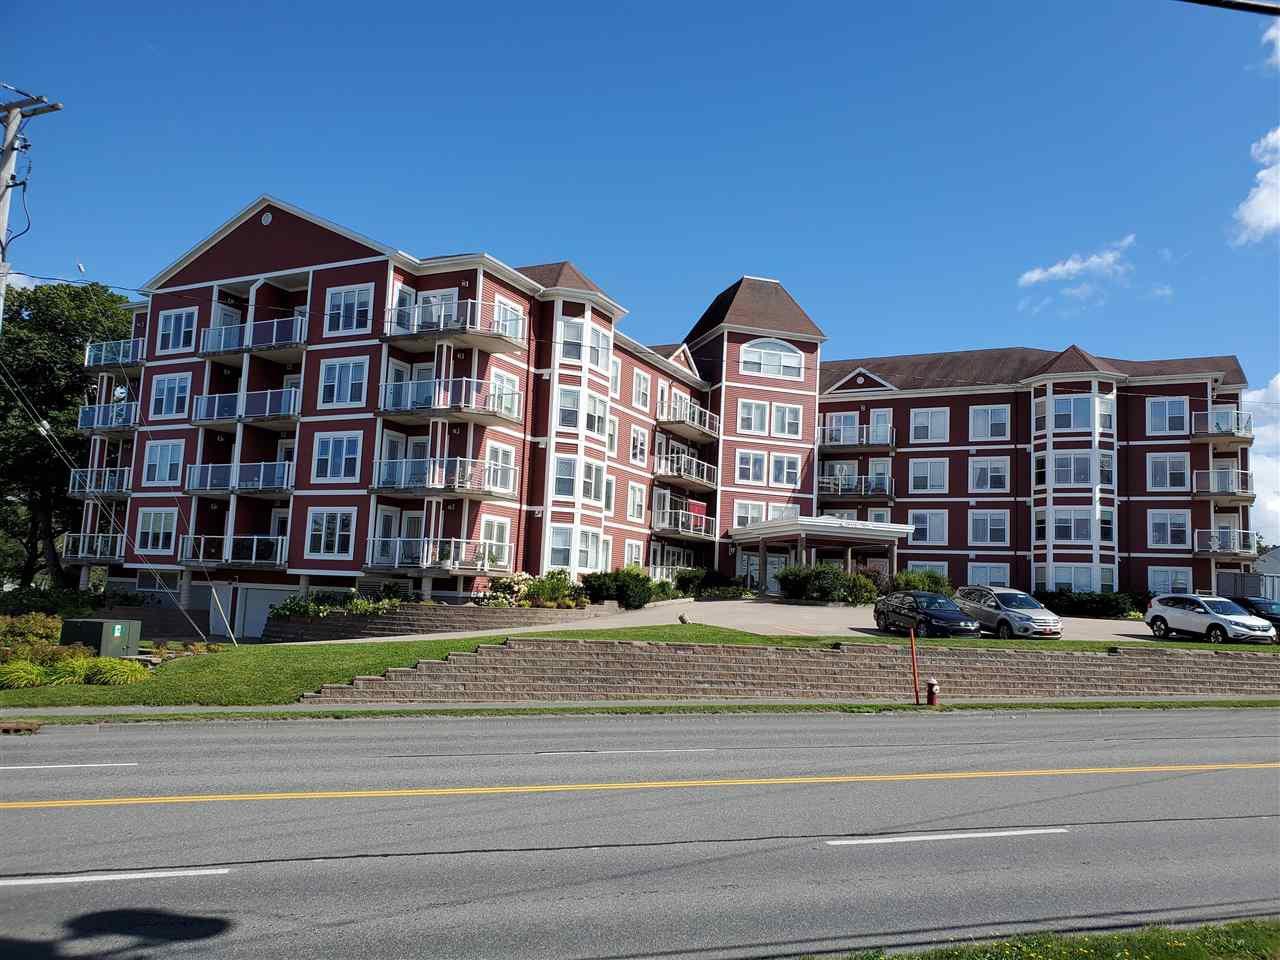 Main Photo: 105 69 Kings Road in Sydney: 201-Sydney Residential for sale (Cape Breton)  : MLS®# 202018838